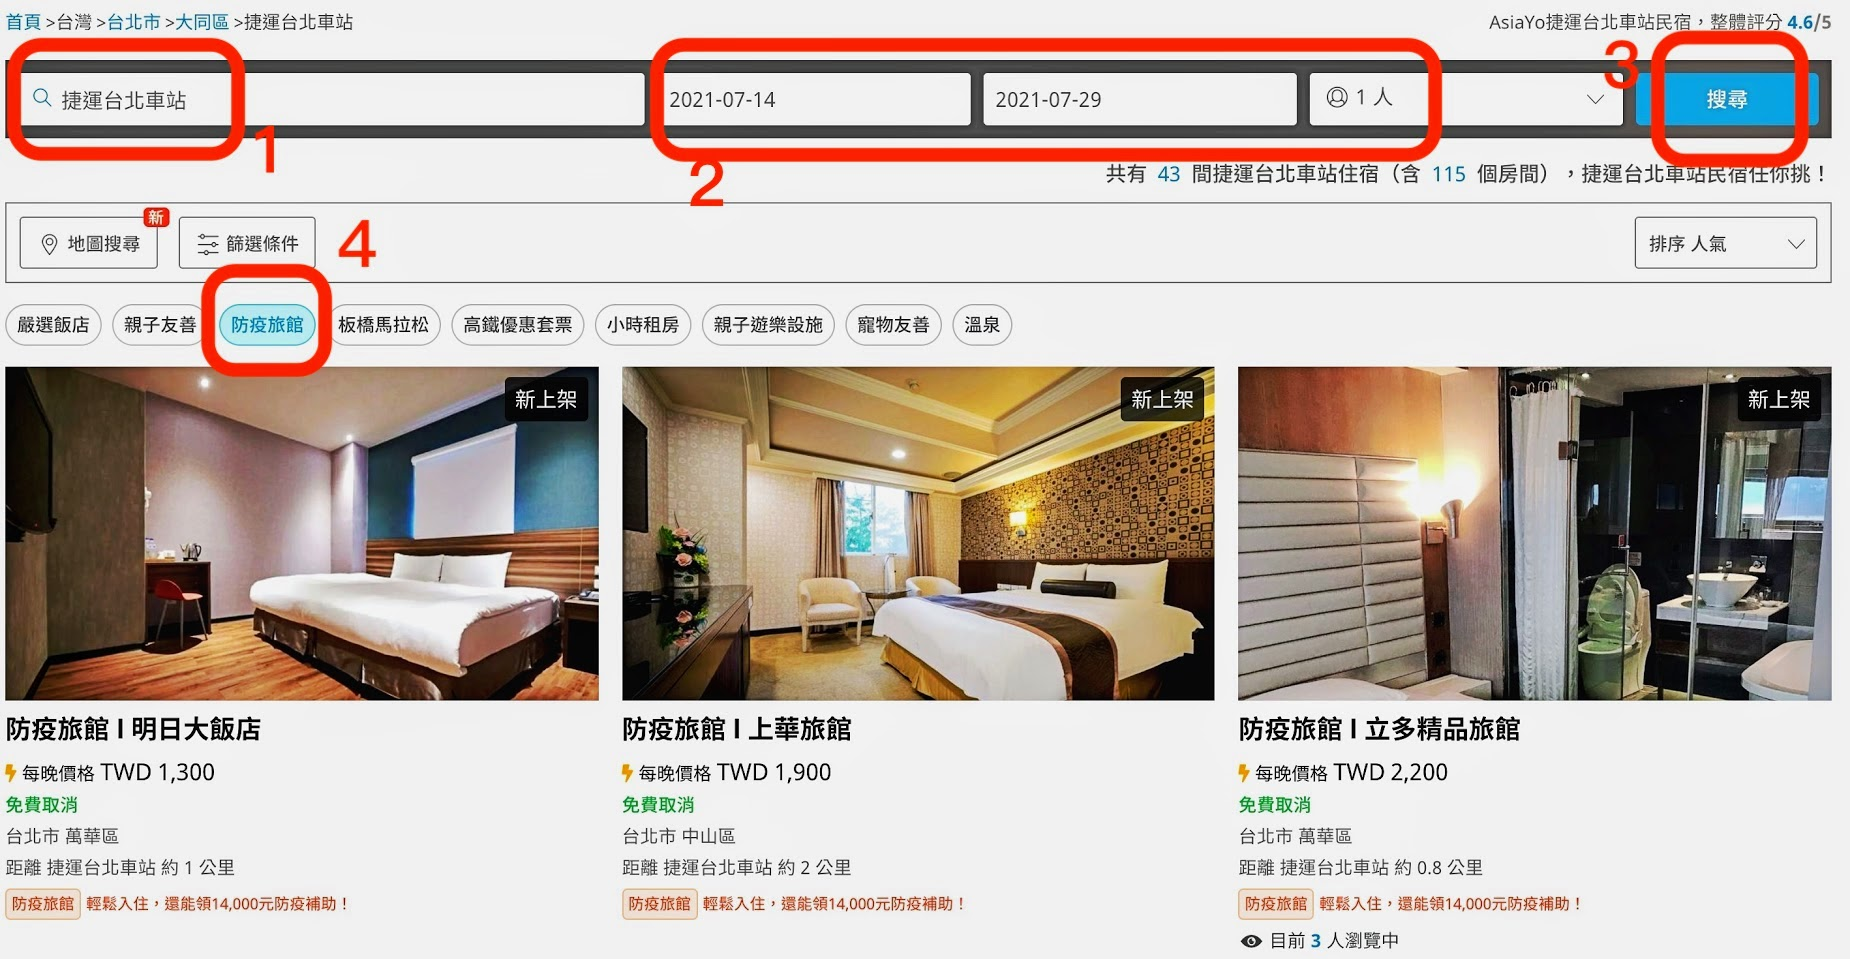 AsiaYo 防疫旅館預訂平台介紹|防疫旅館有陽台、可開窗、大坪數、星級飯店任你挑